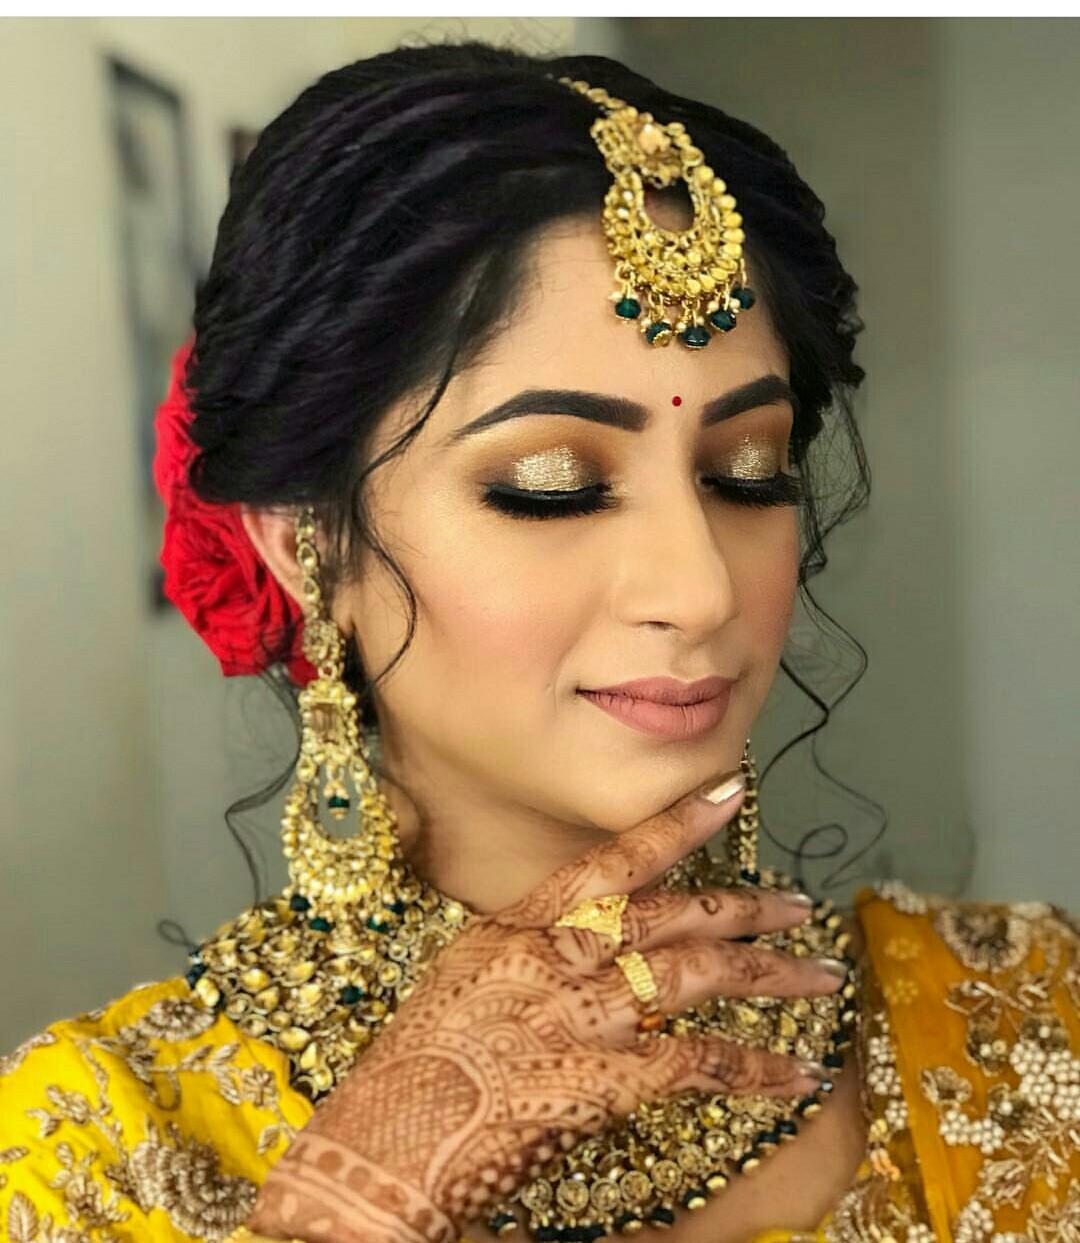 shagun-bhargava-makeup-artist-delhi-ncr